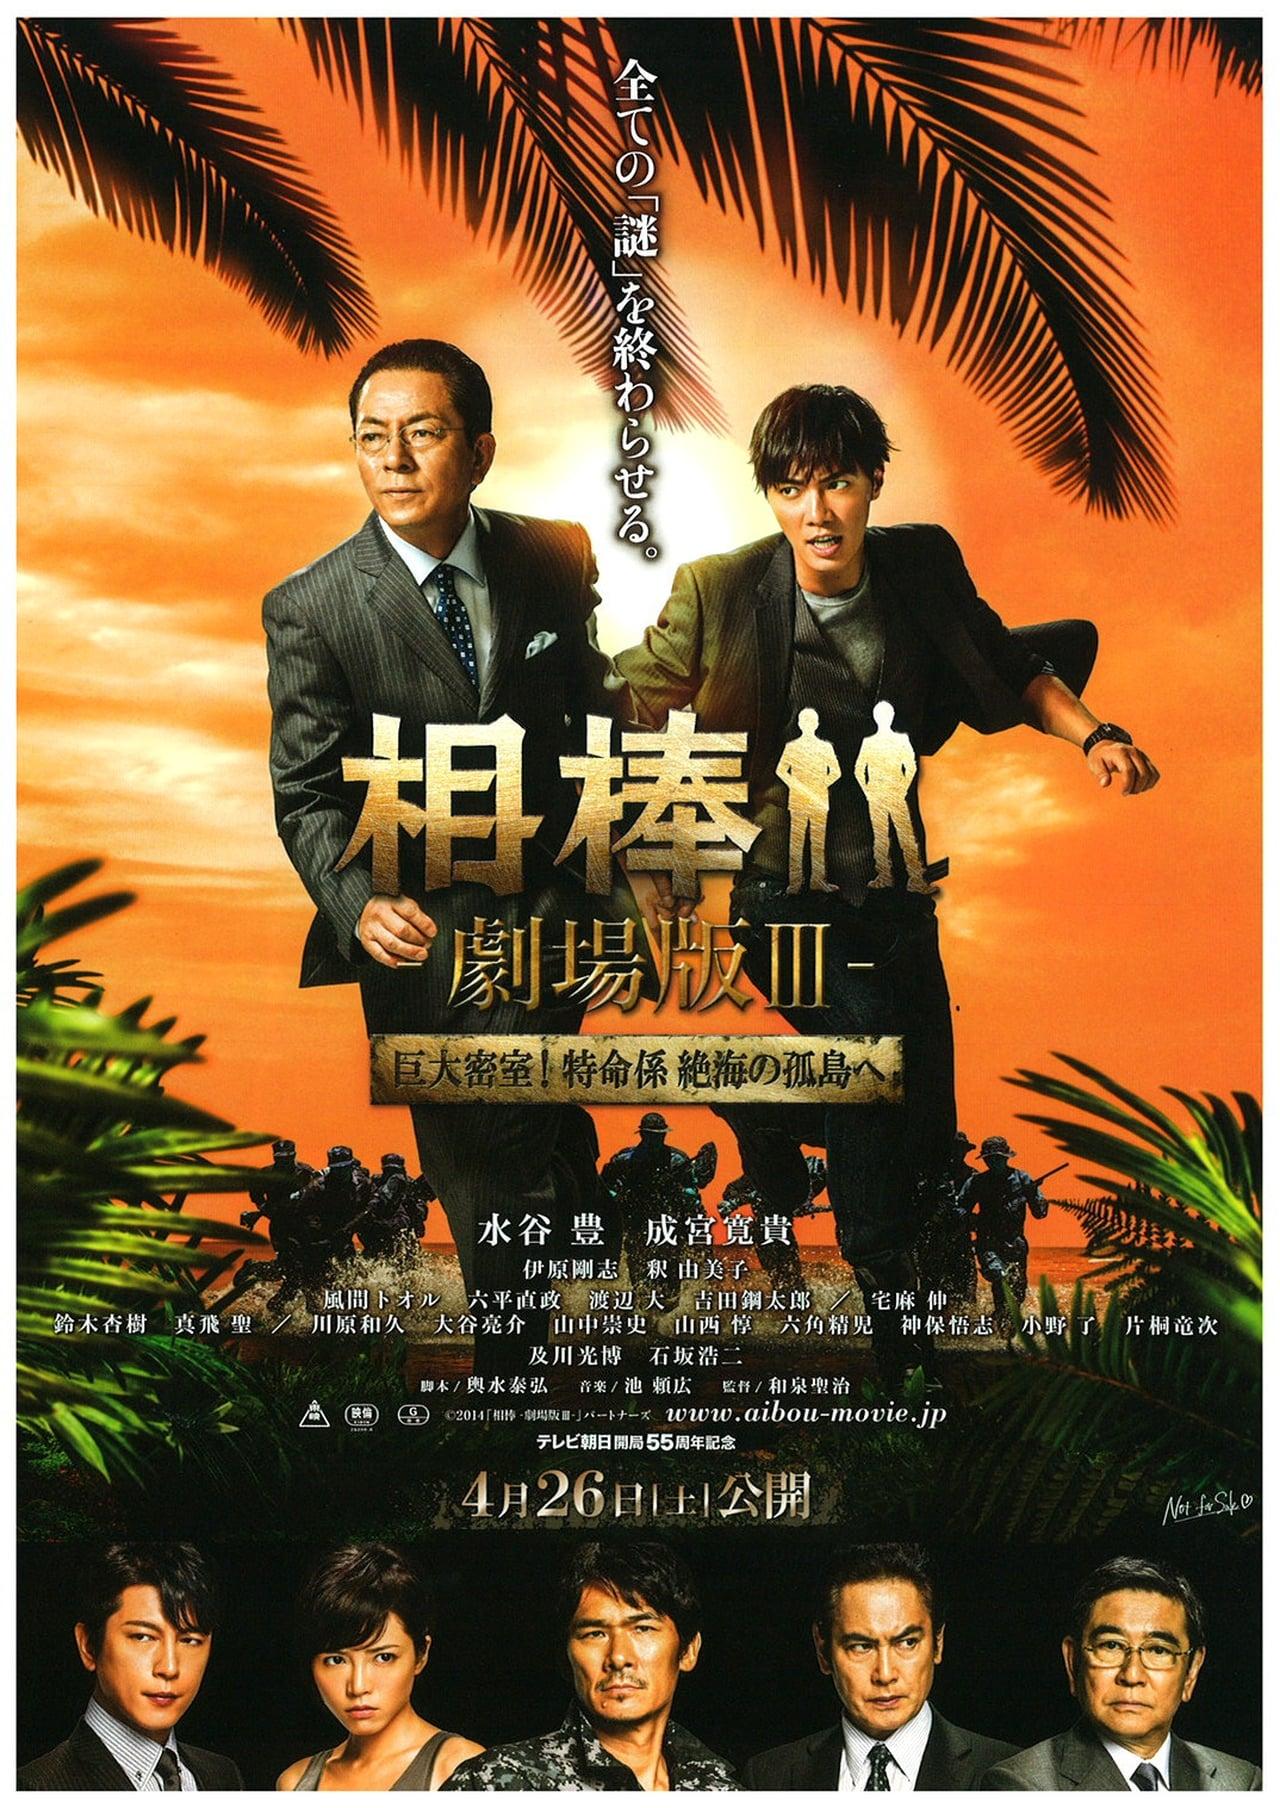 Partners: The Movie III